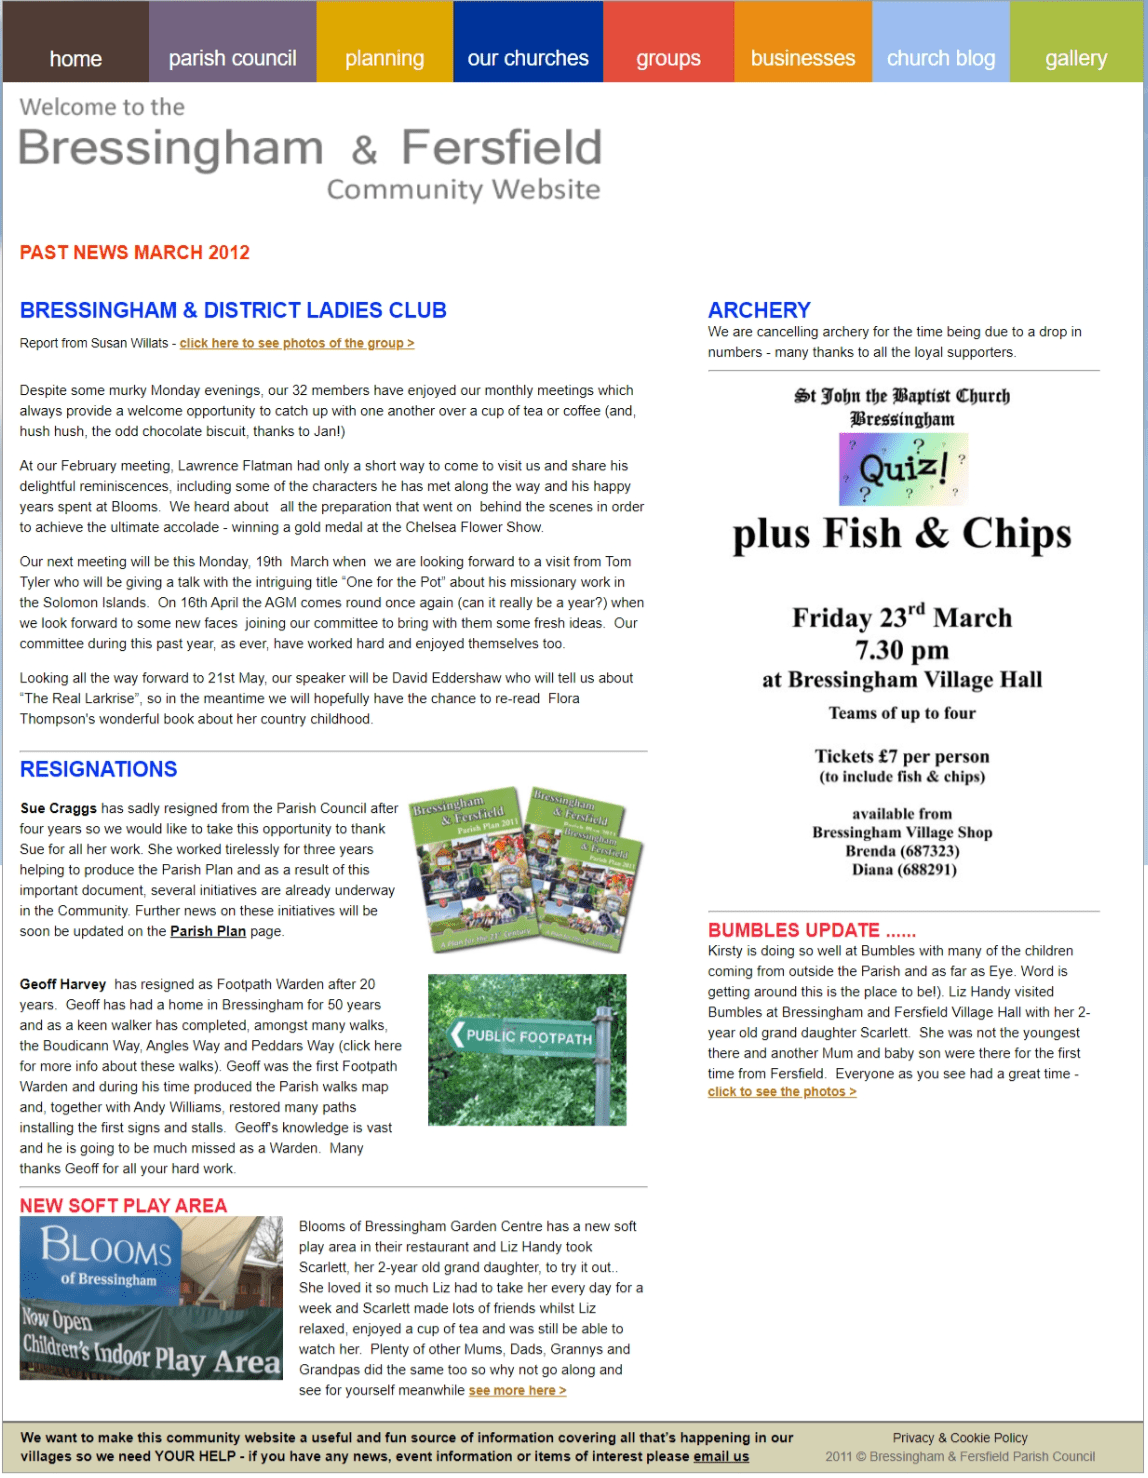 Past News Mar 2012 - Bressingham and District Ladies Club Report